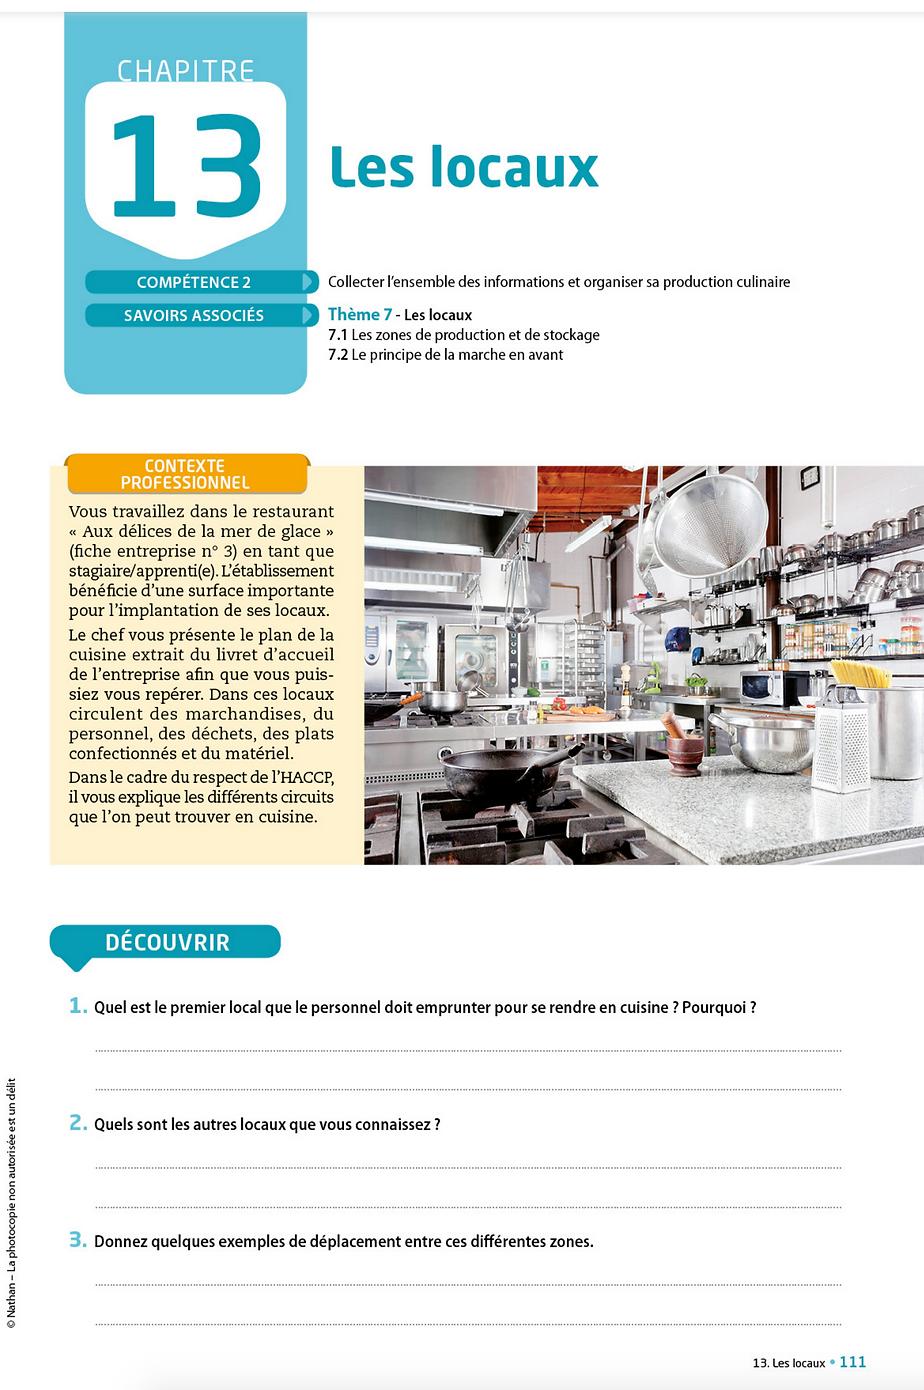 Locaux 111.png